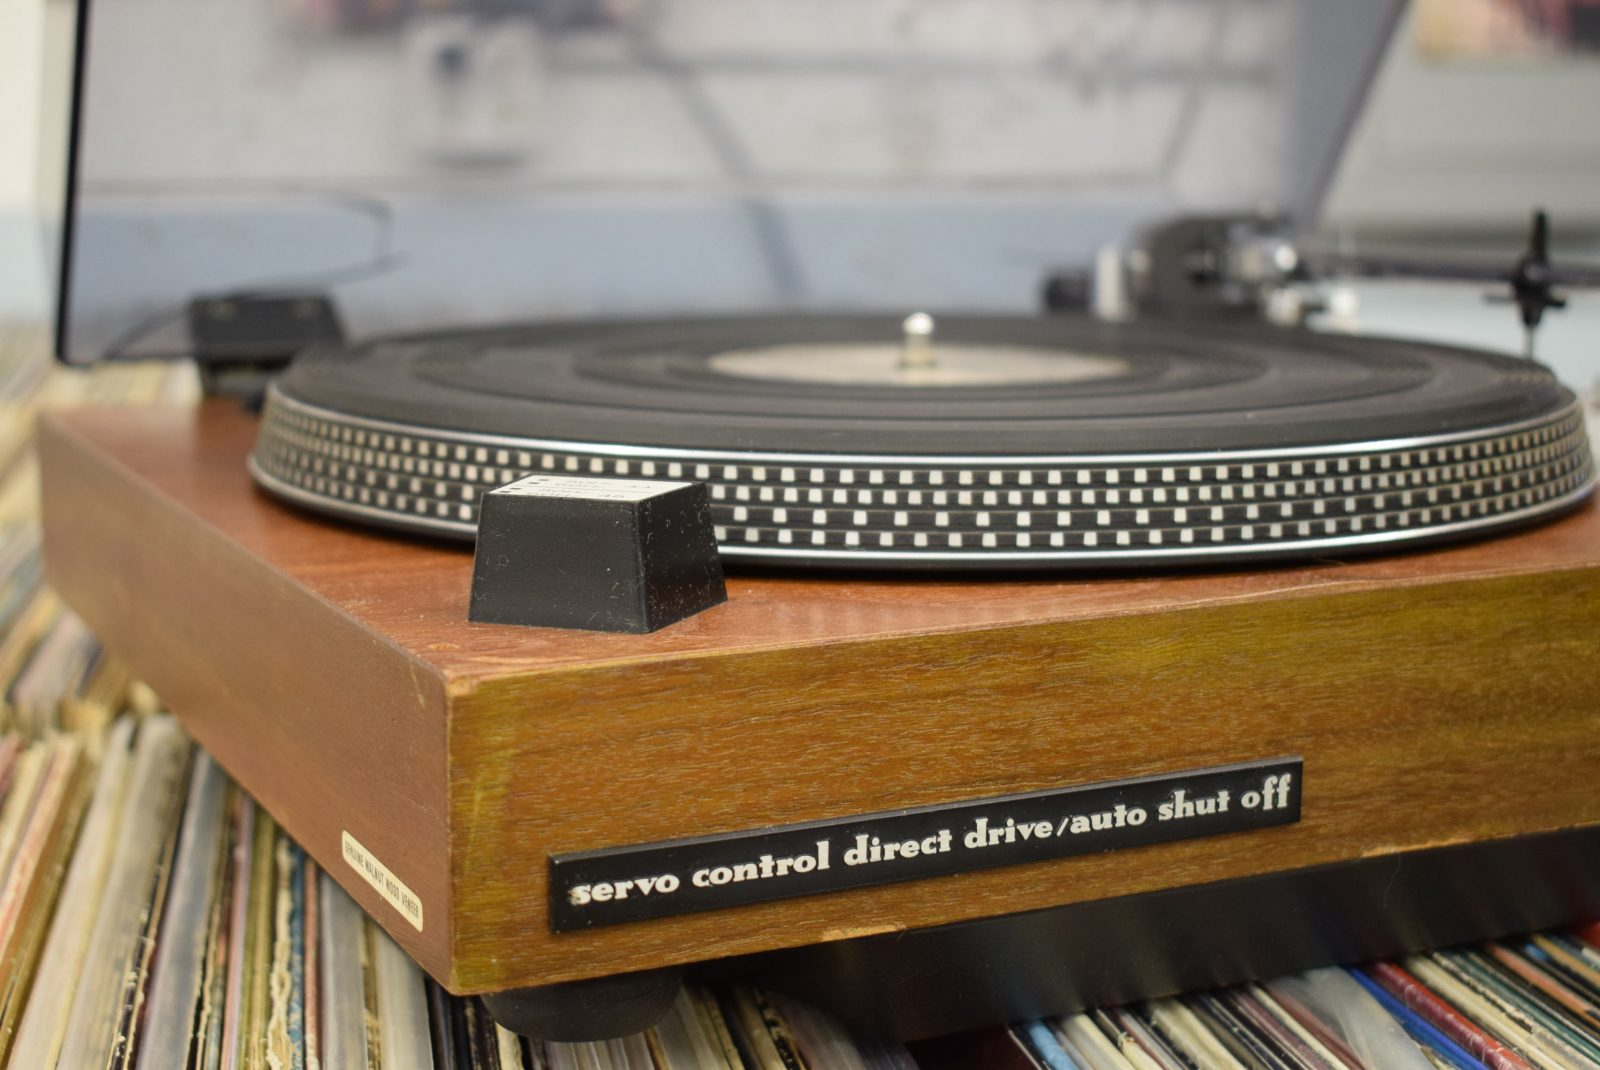 Marantz Turntable - Model: 6300